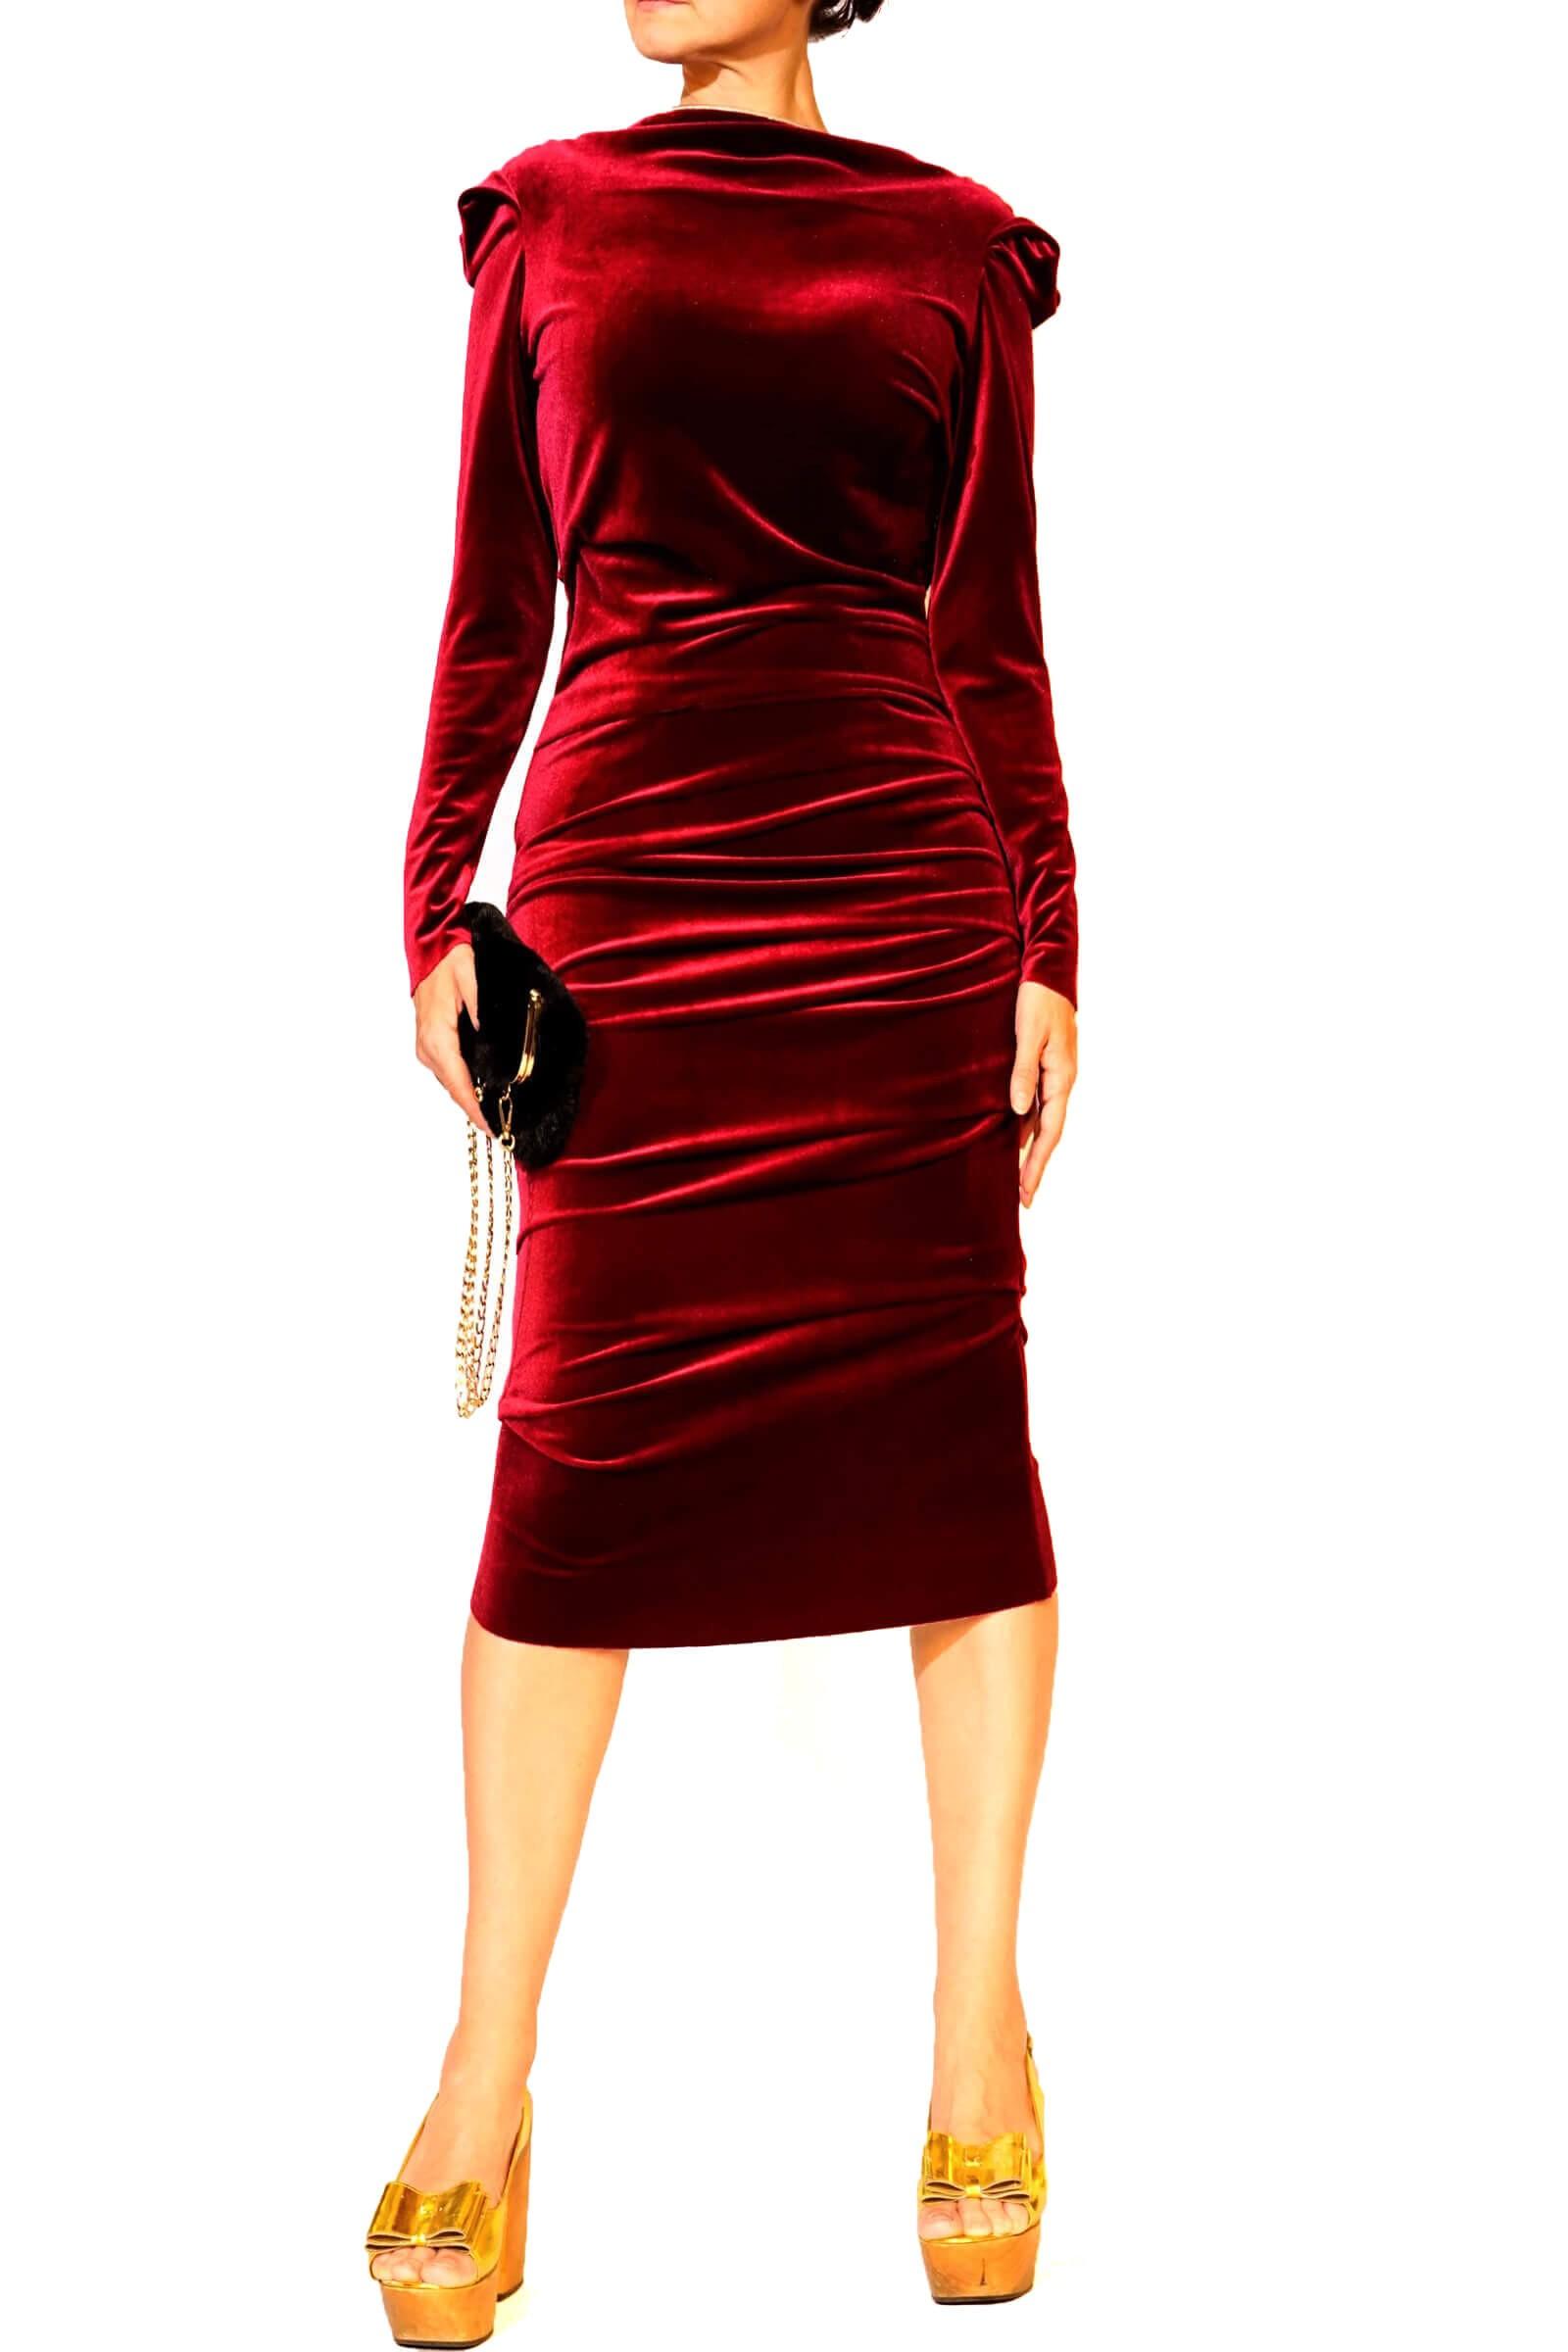 Red velvet dress with pleats